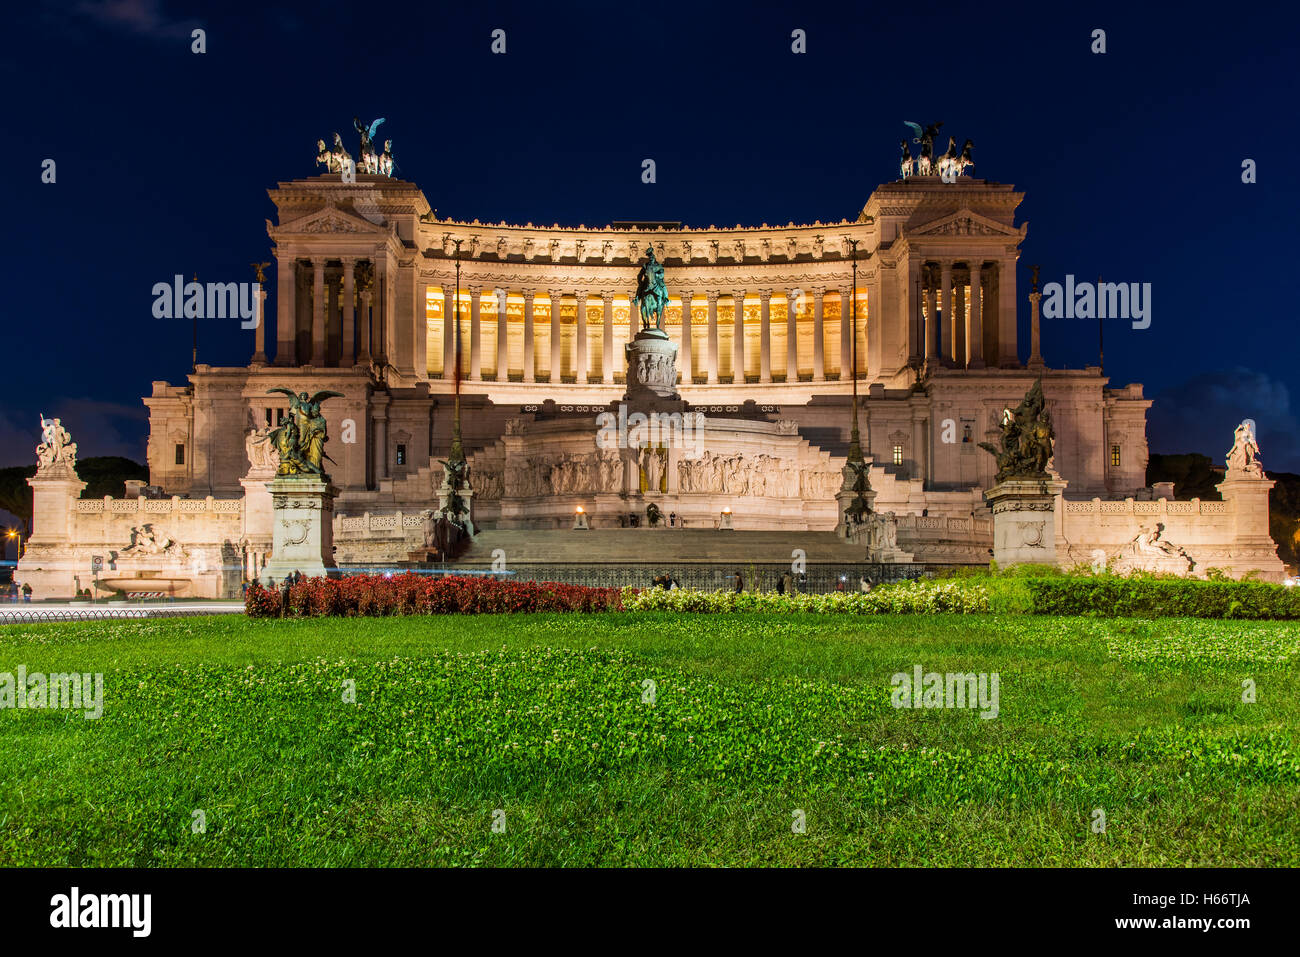 Vue de la nuit de l'Altare della Patria ou monument Vittoriano, Rome, Latium, Italie Photo Stock